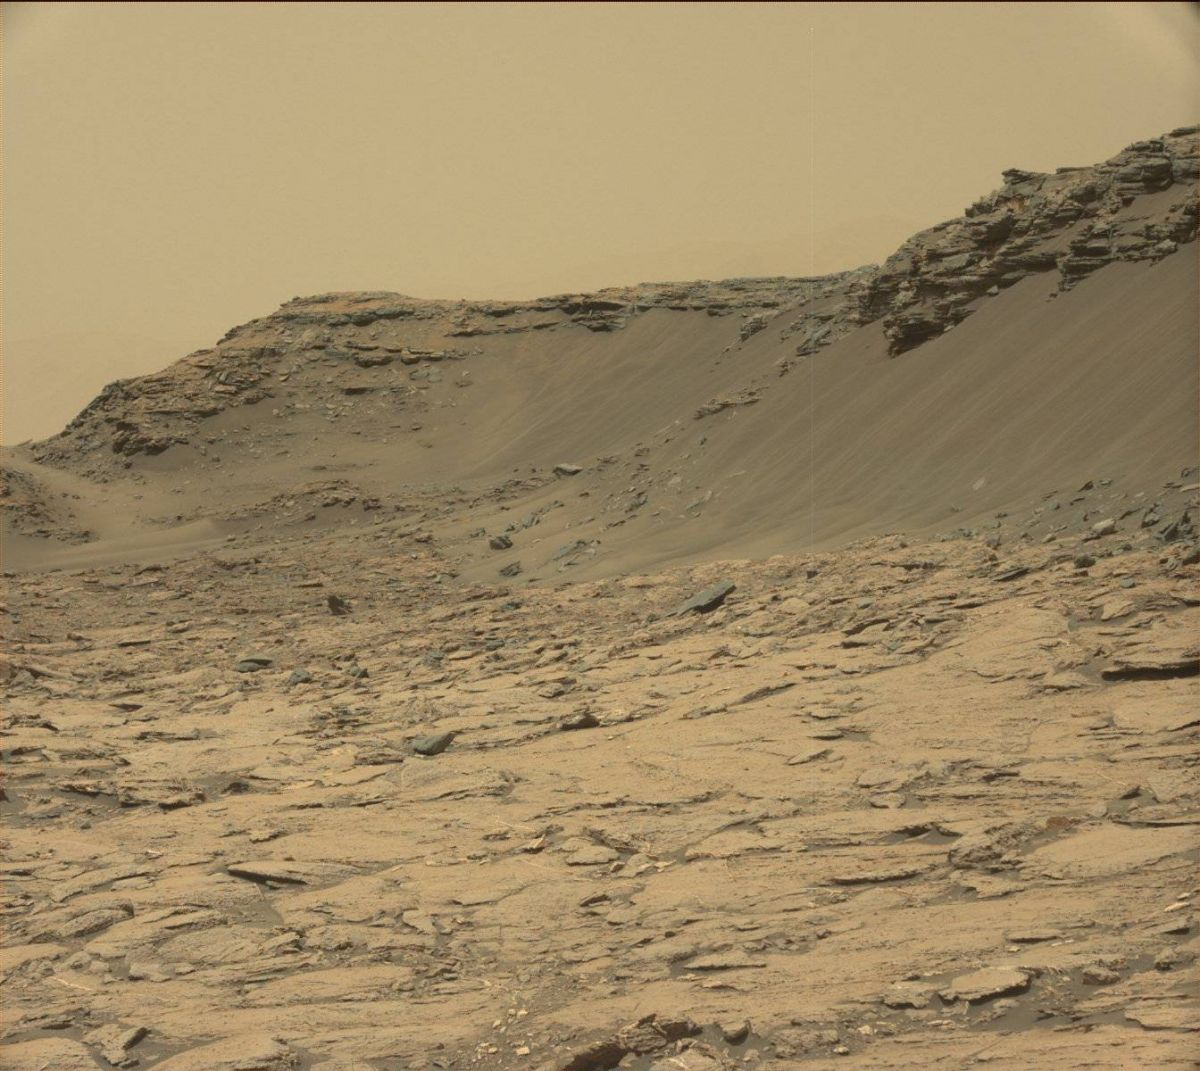 Curiosity Mars Rover Reaches New Drill Site